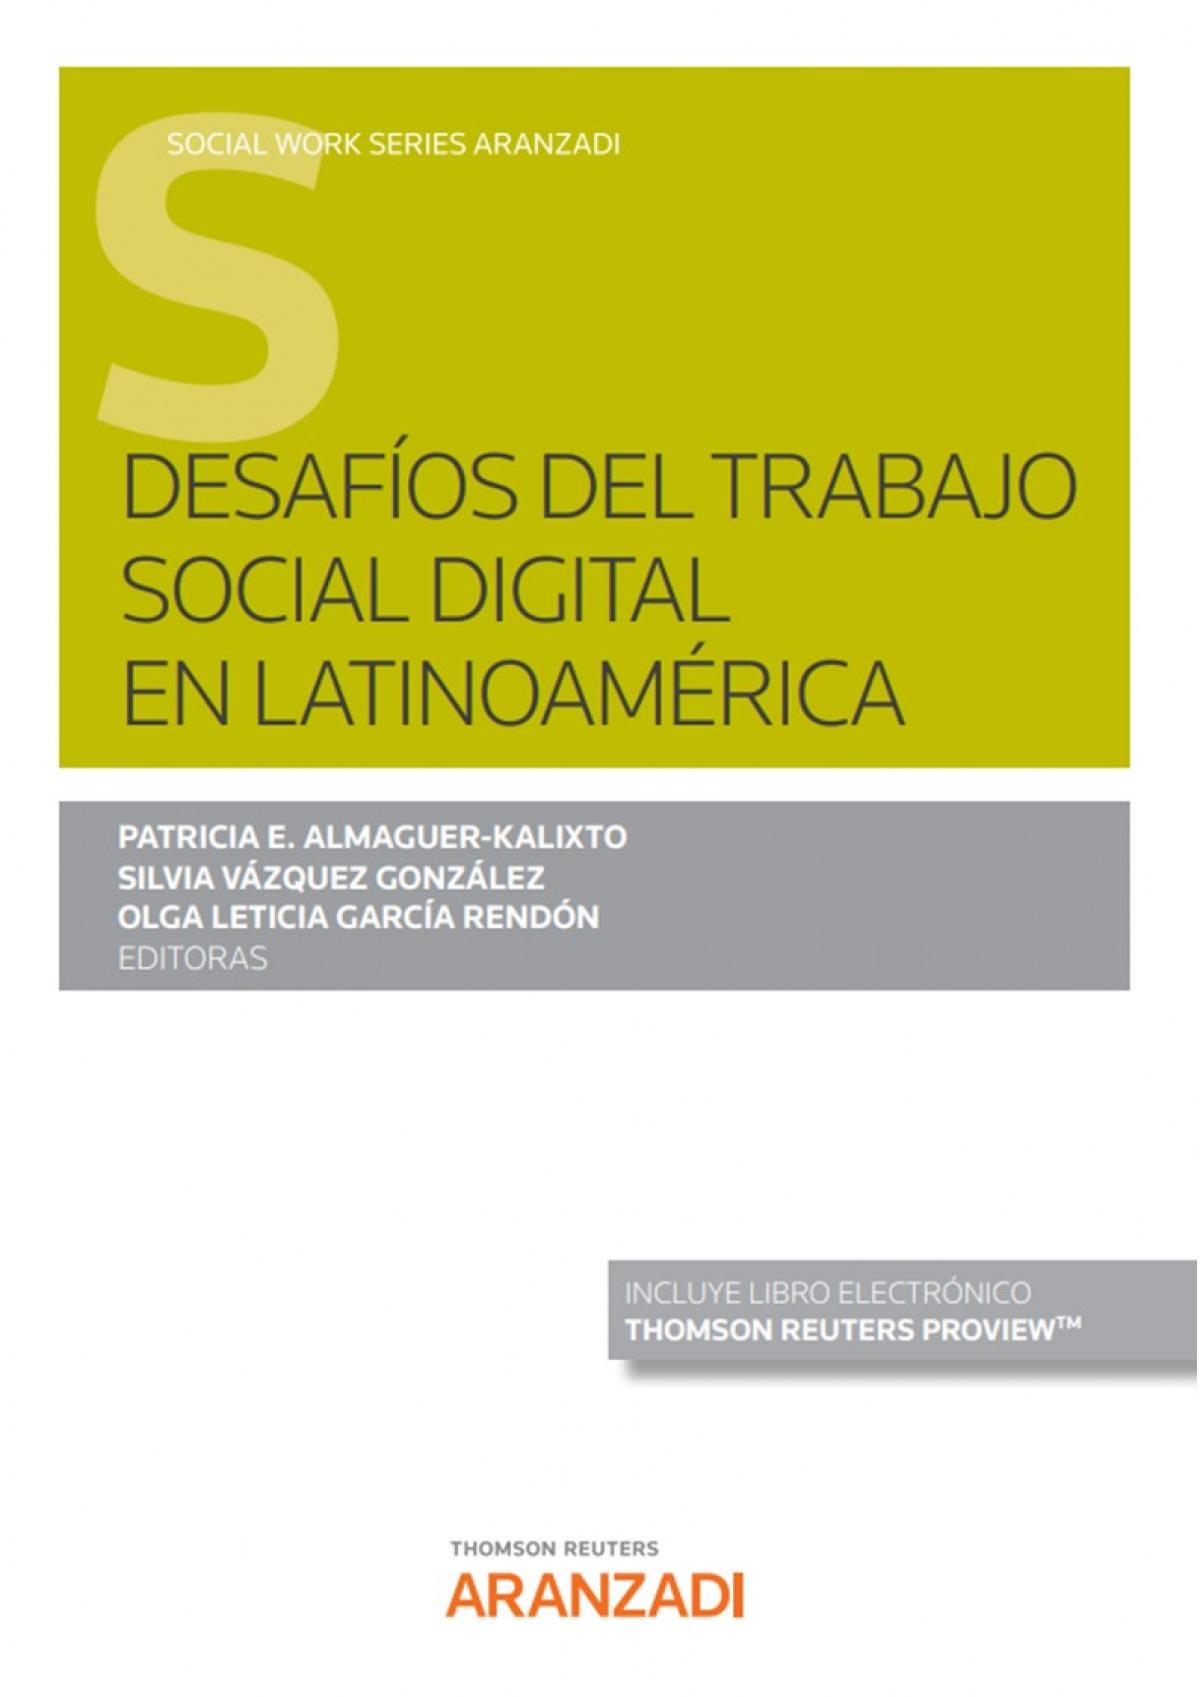 Desafíos del trabajo social digital en Latinoamérica (Papel + e-book)